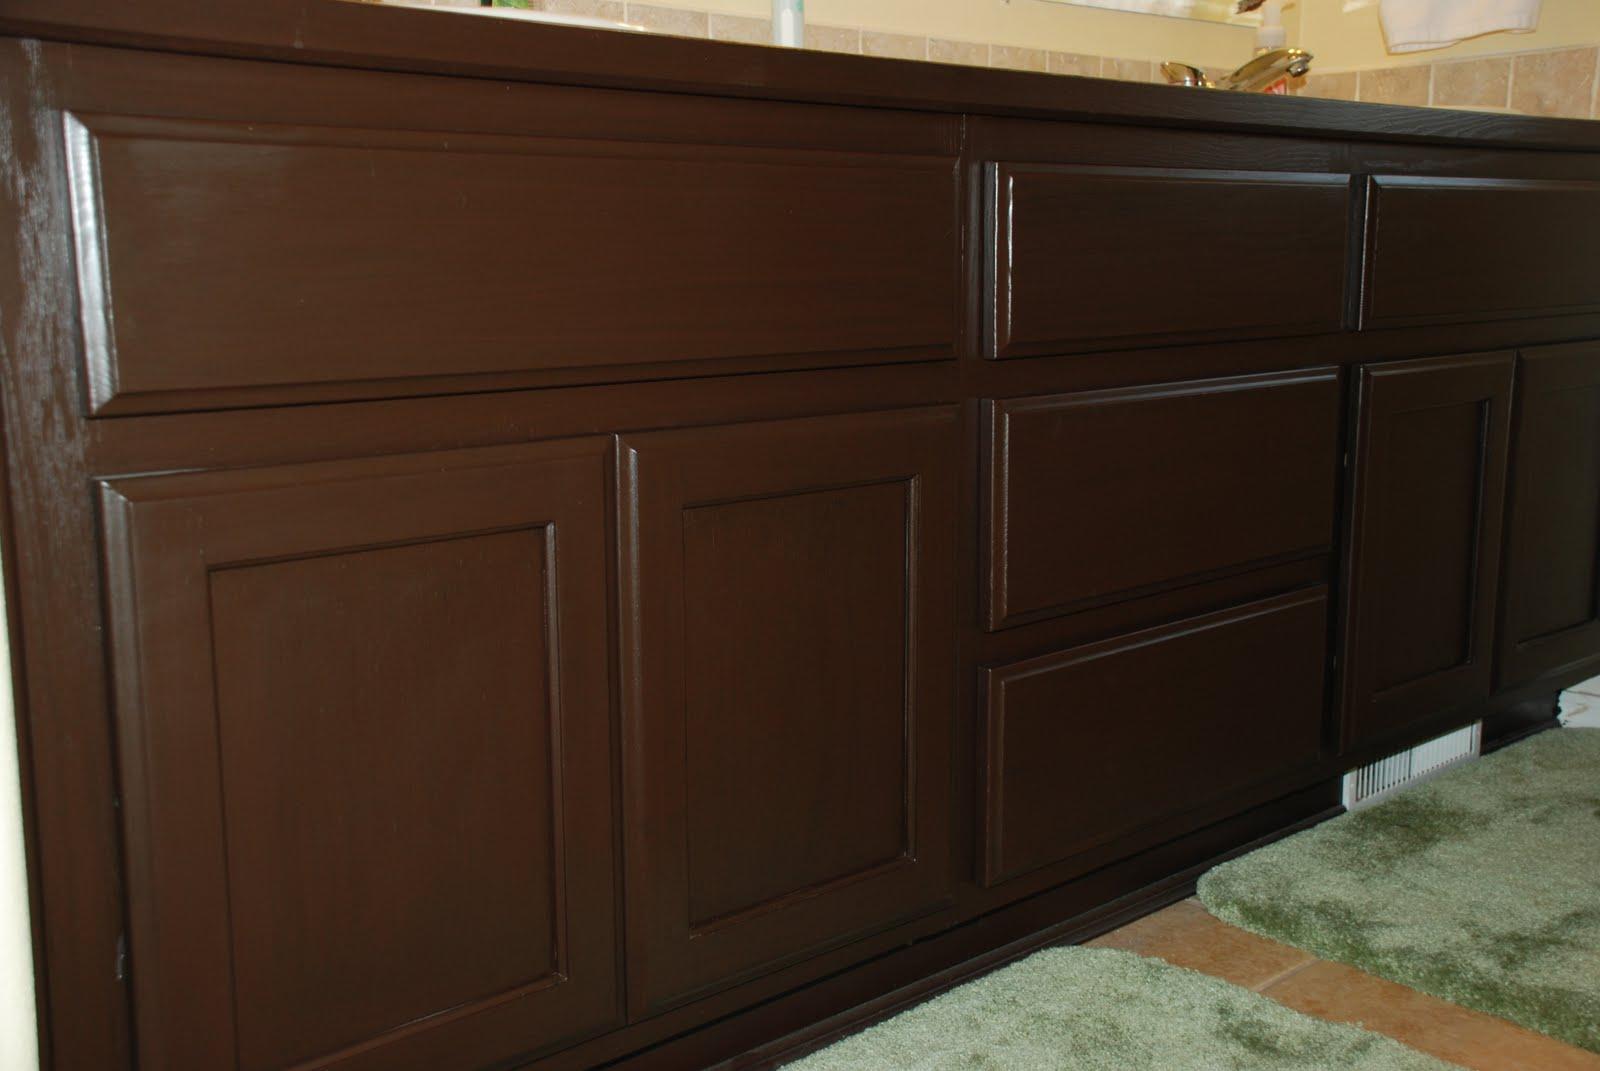 Kitchen Cabinets Refacing Kits Rust Oleum Cabinet Transformation Kit